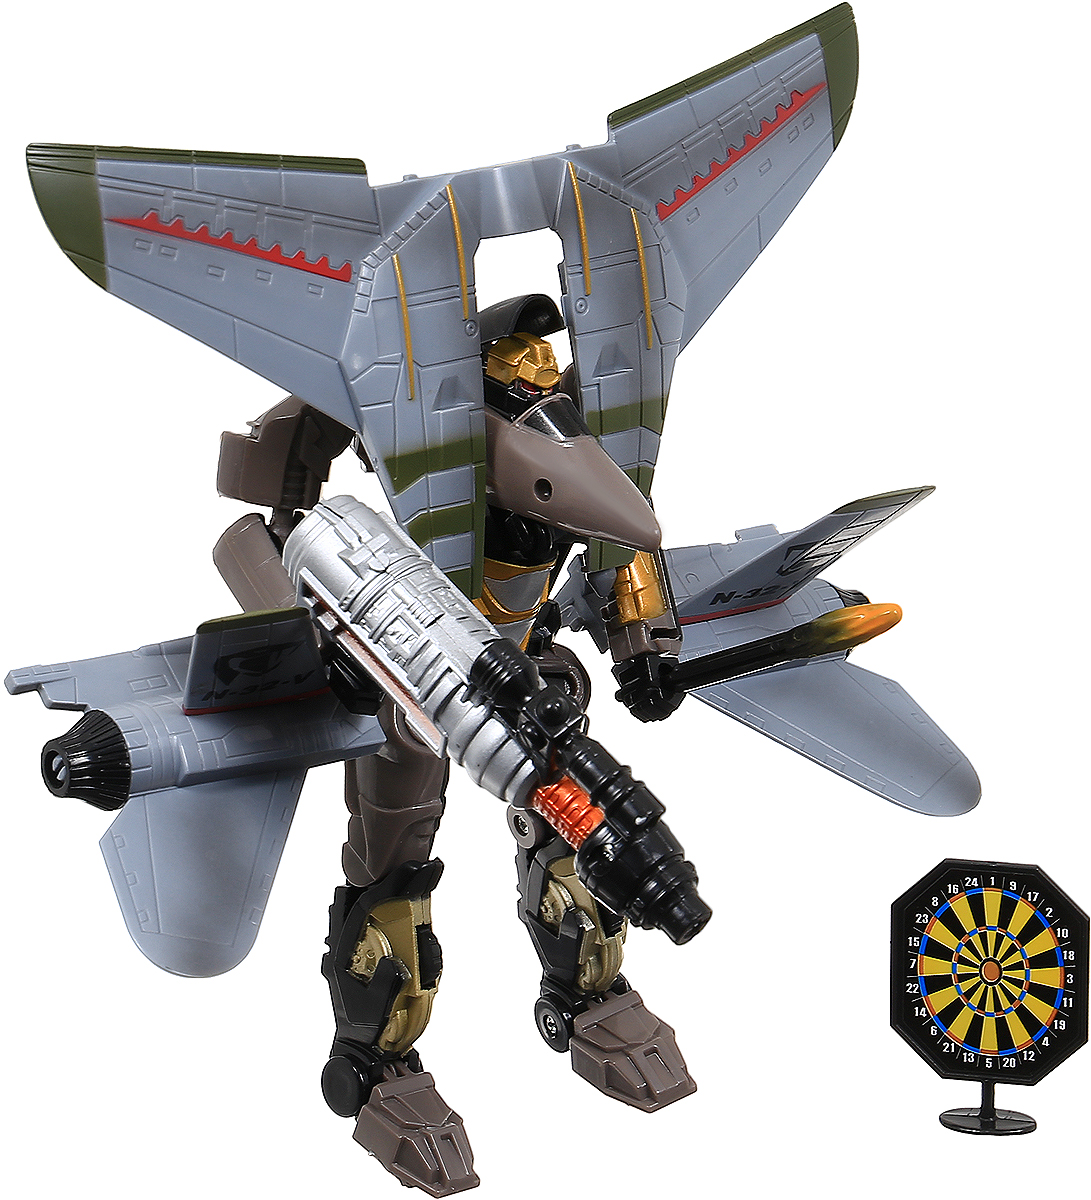 Able Star Робот-трансформер Fighter Jet